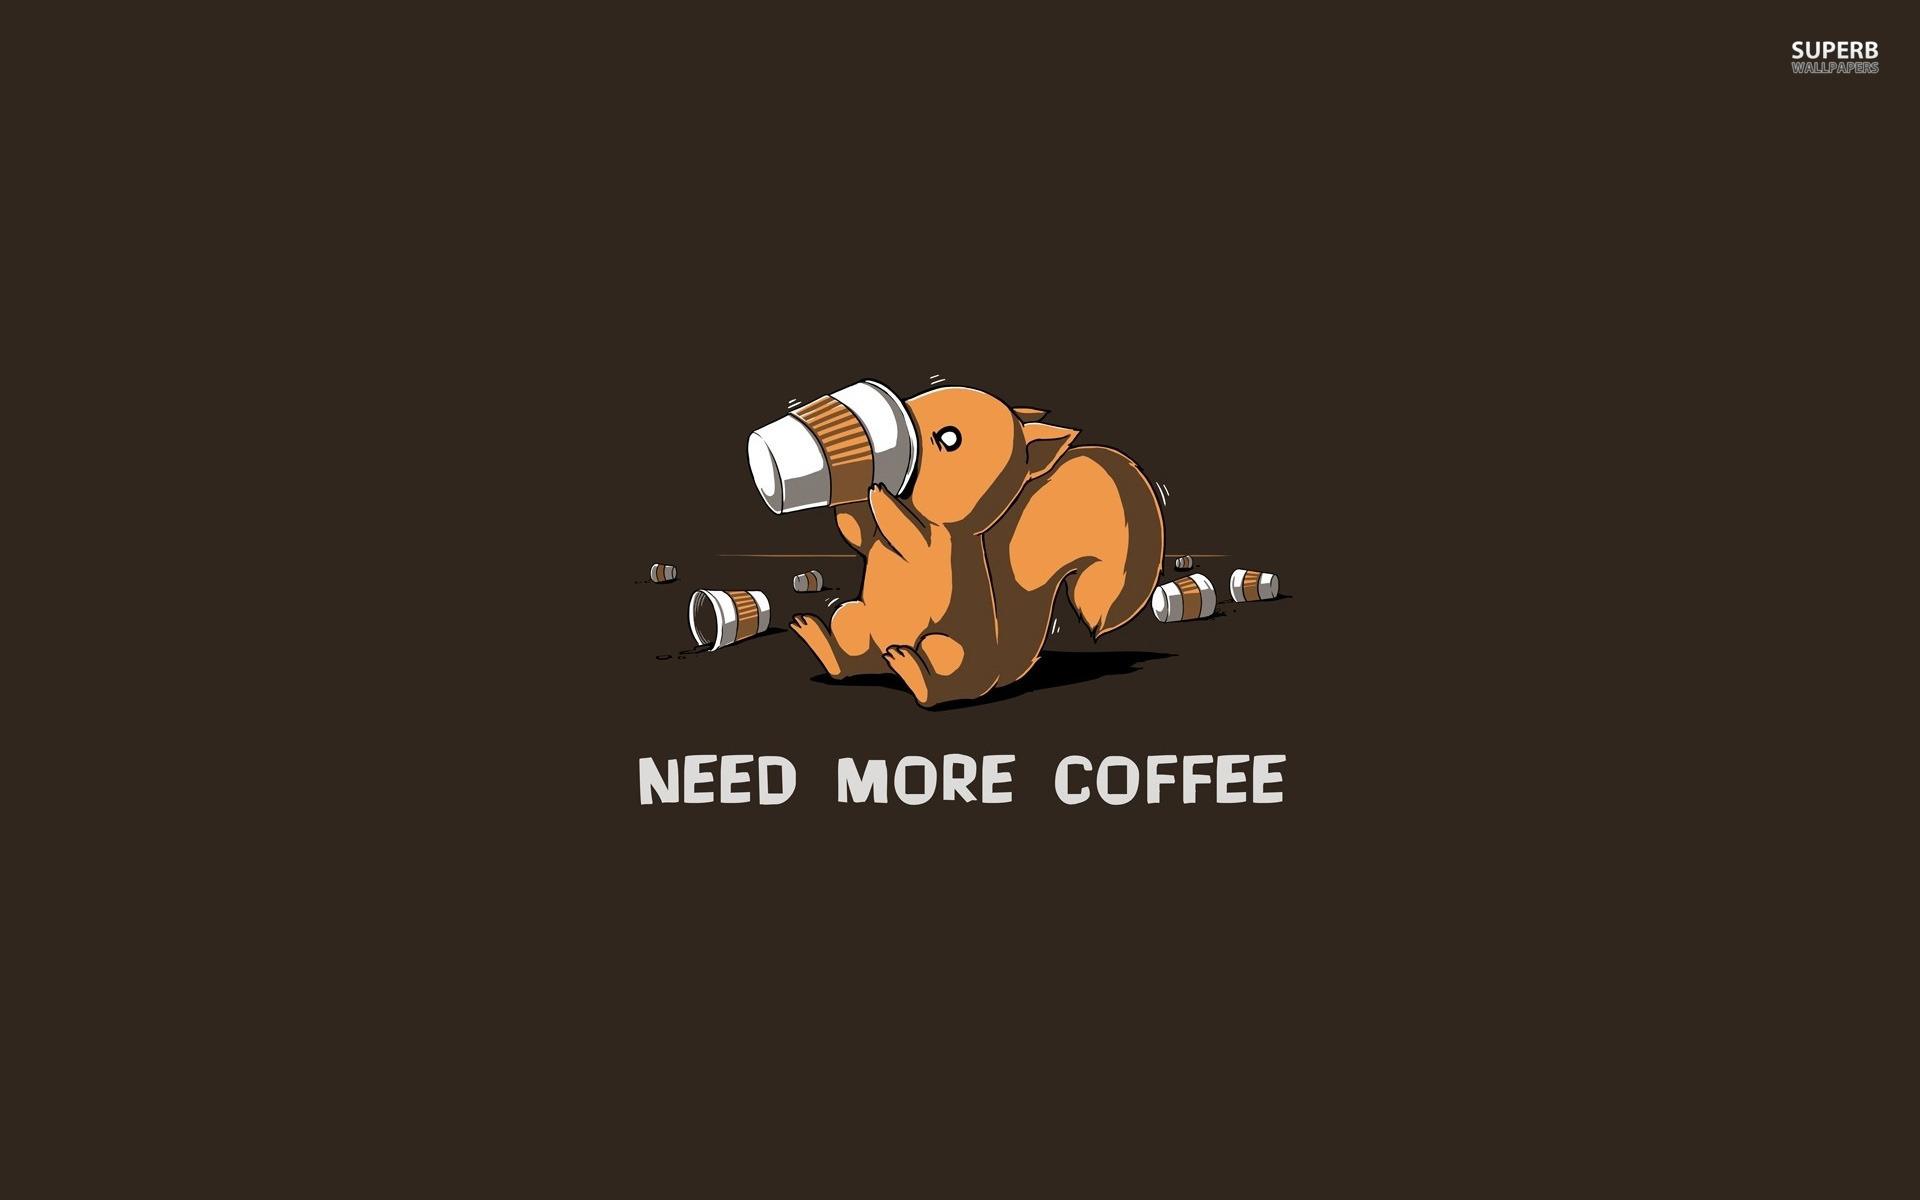 Need more coffee wallpaper 1920x1200